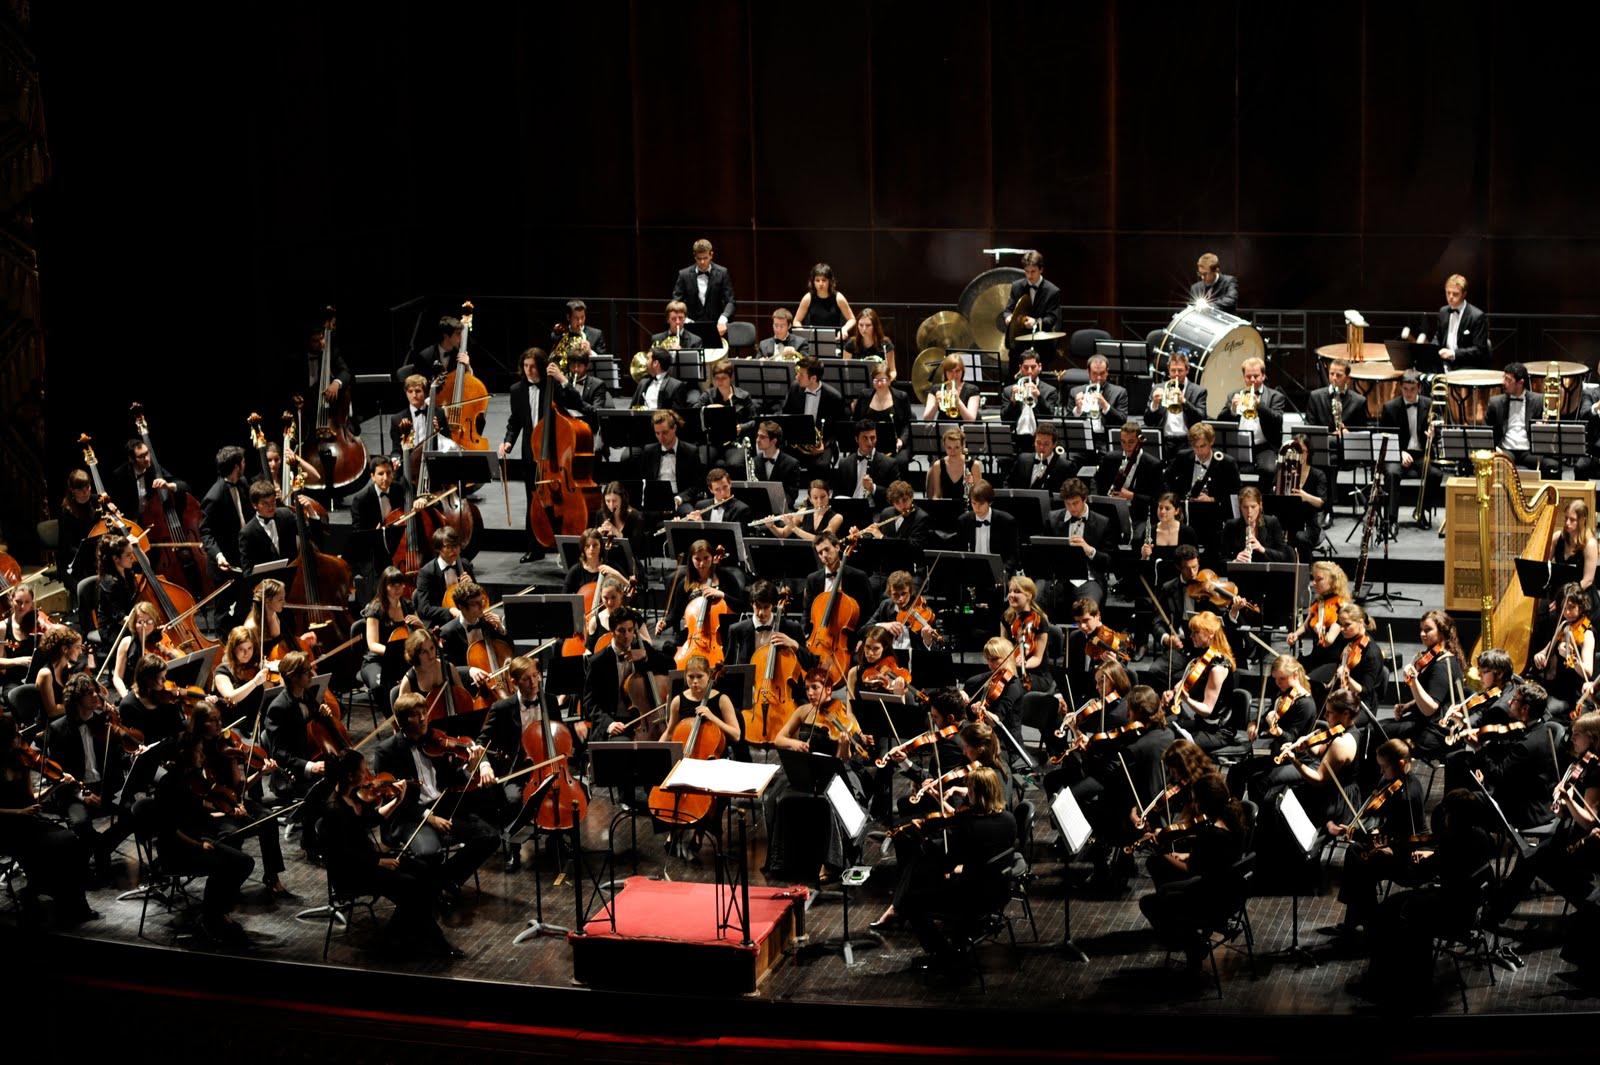 Fanáticos da Ópera / Opera Fanatics: Gustav Mahler ...